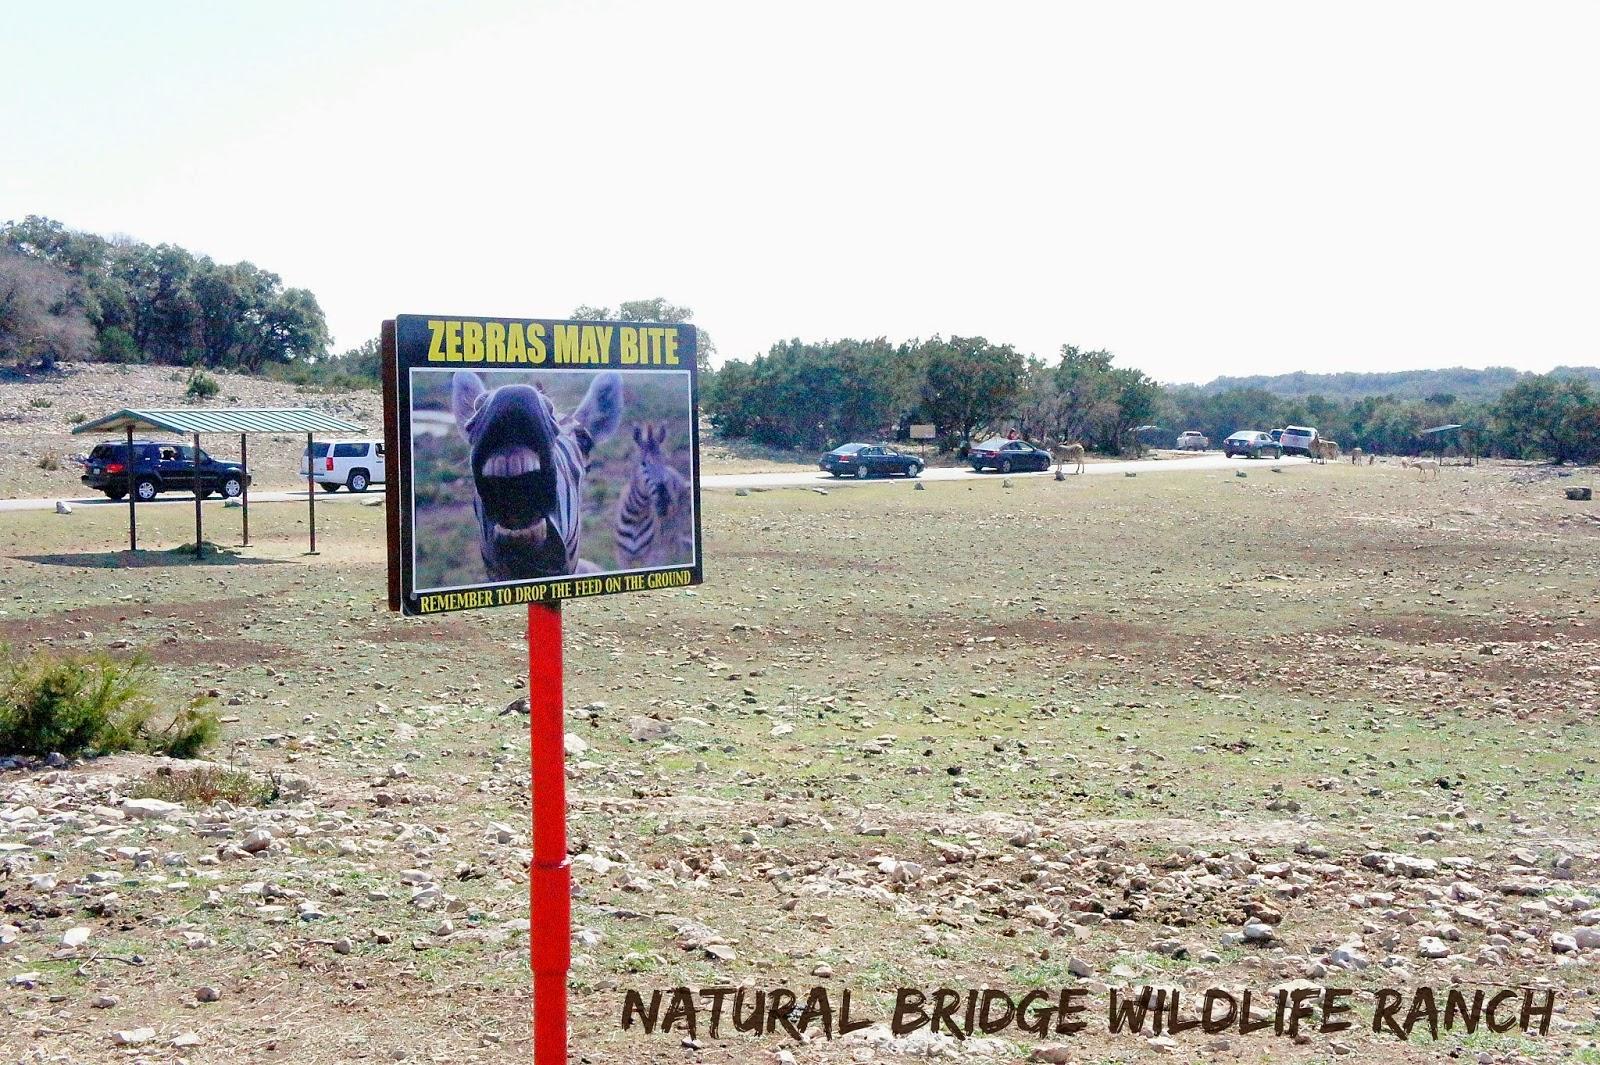 Zebras at the Natural Bridge Wildlife Ranch in San Antonio, Texas